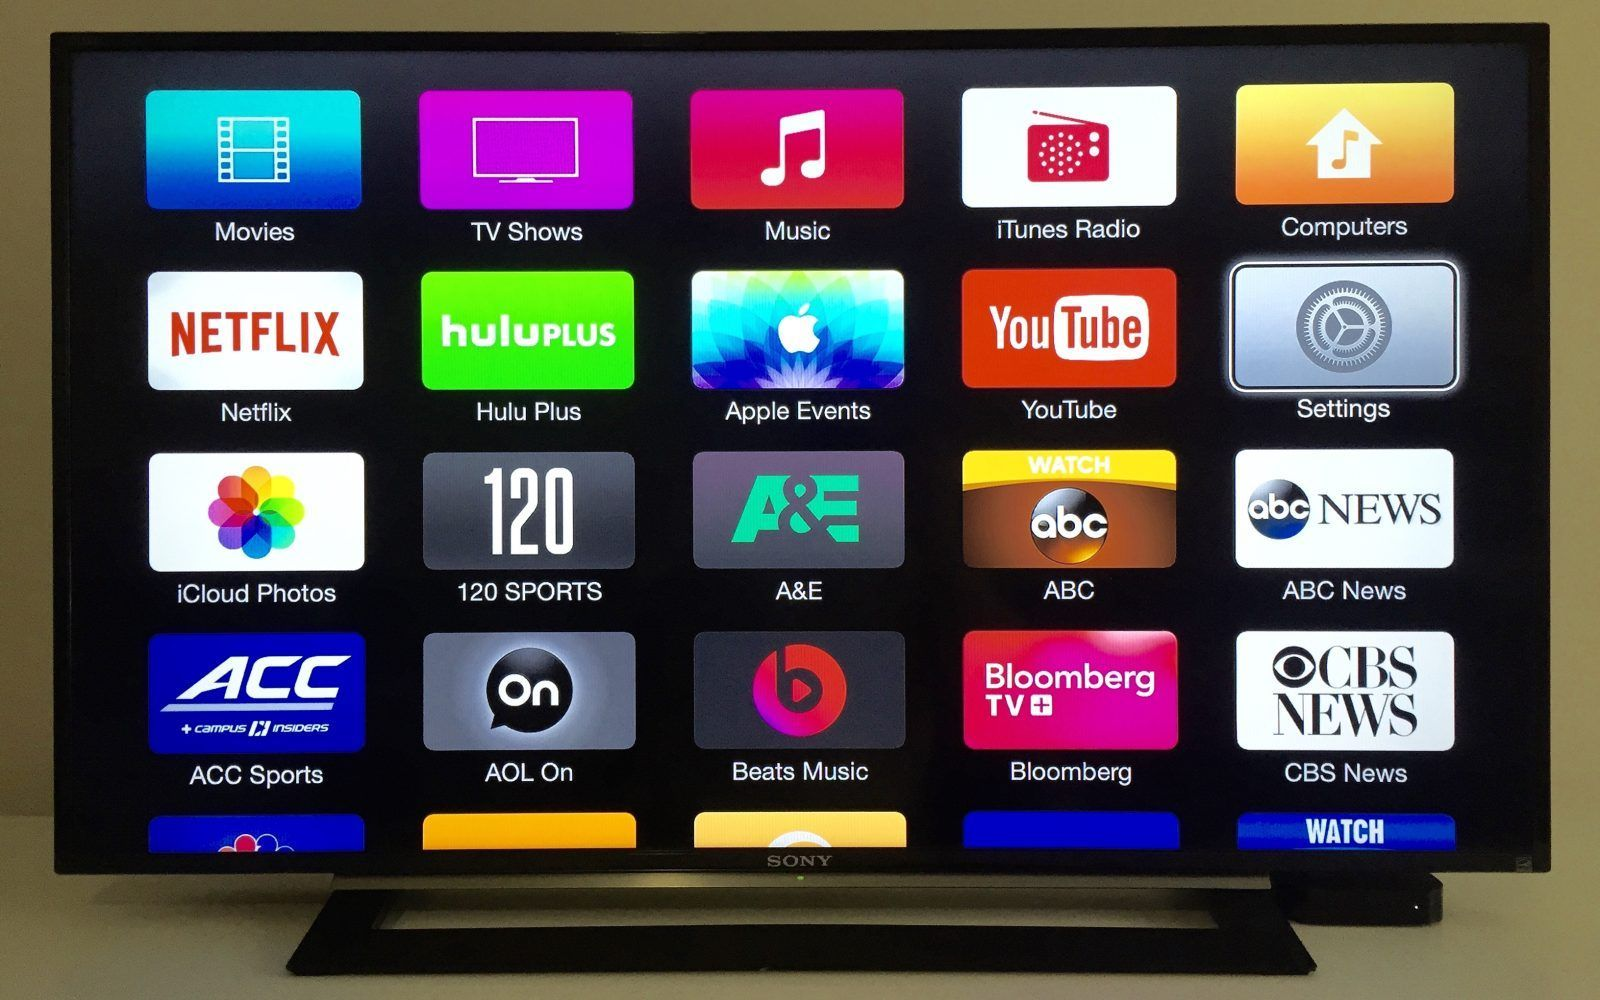 Wiggly Smart Tv Remote Tvb Smarttvsamsung Smart Tv Samsung In